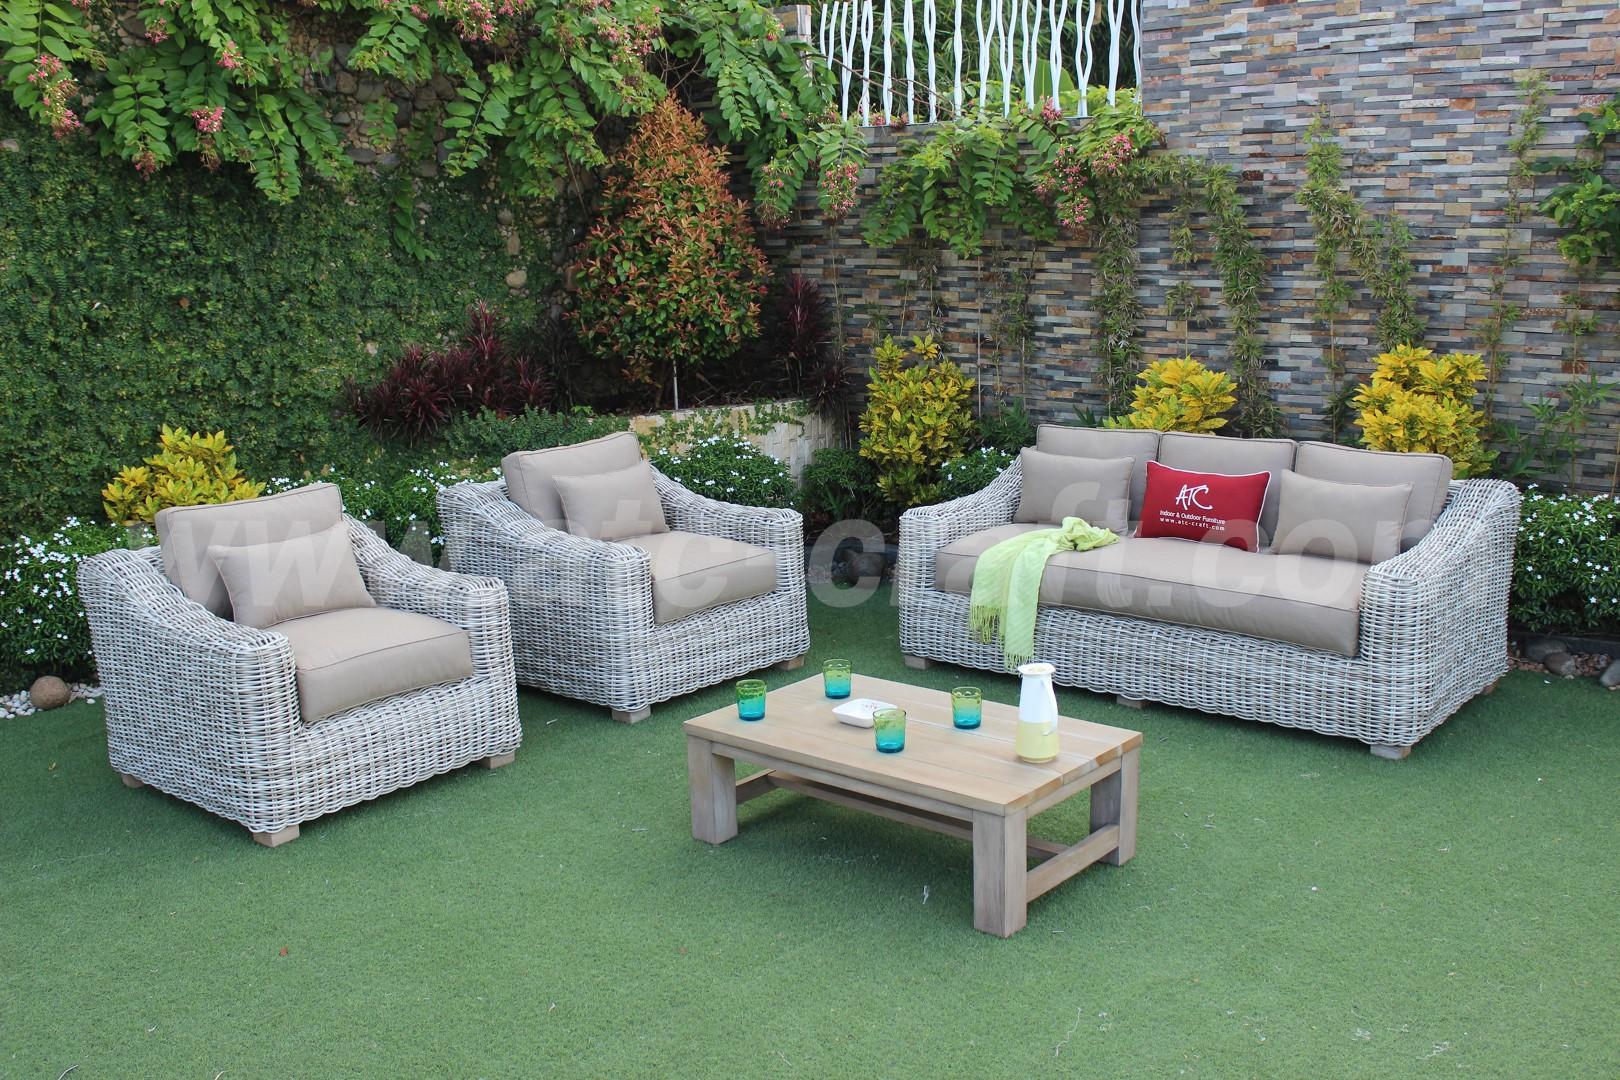 Elegant Casual Outdoor Sofa Set for Garden Living RASF-197 ... on Patio Living Room Set id=52900